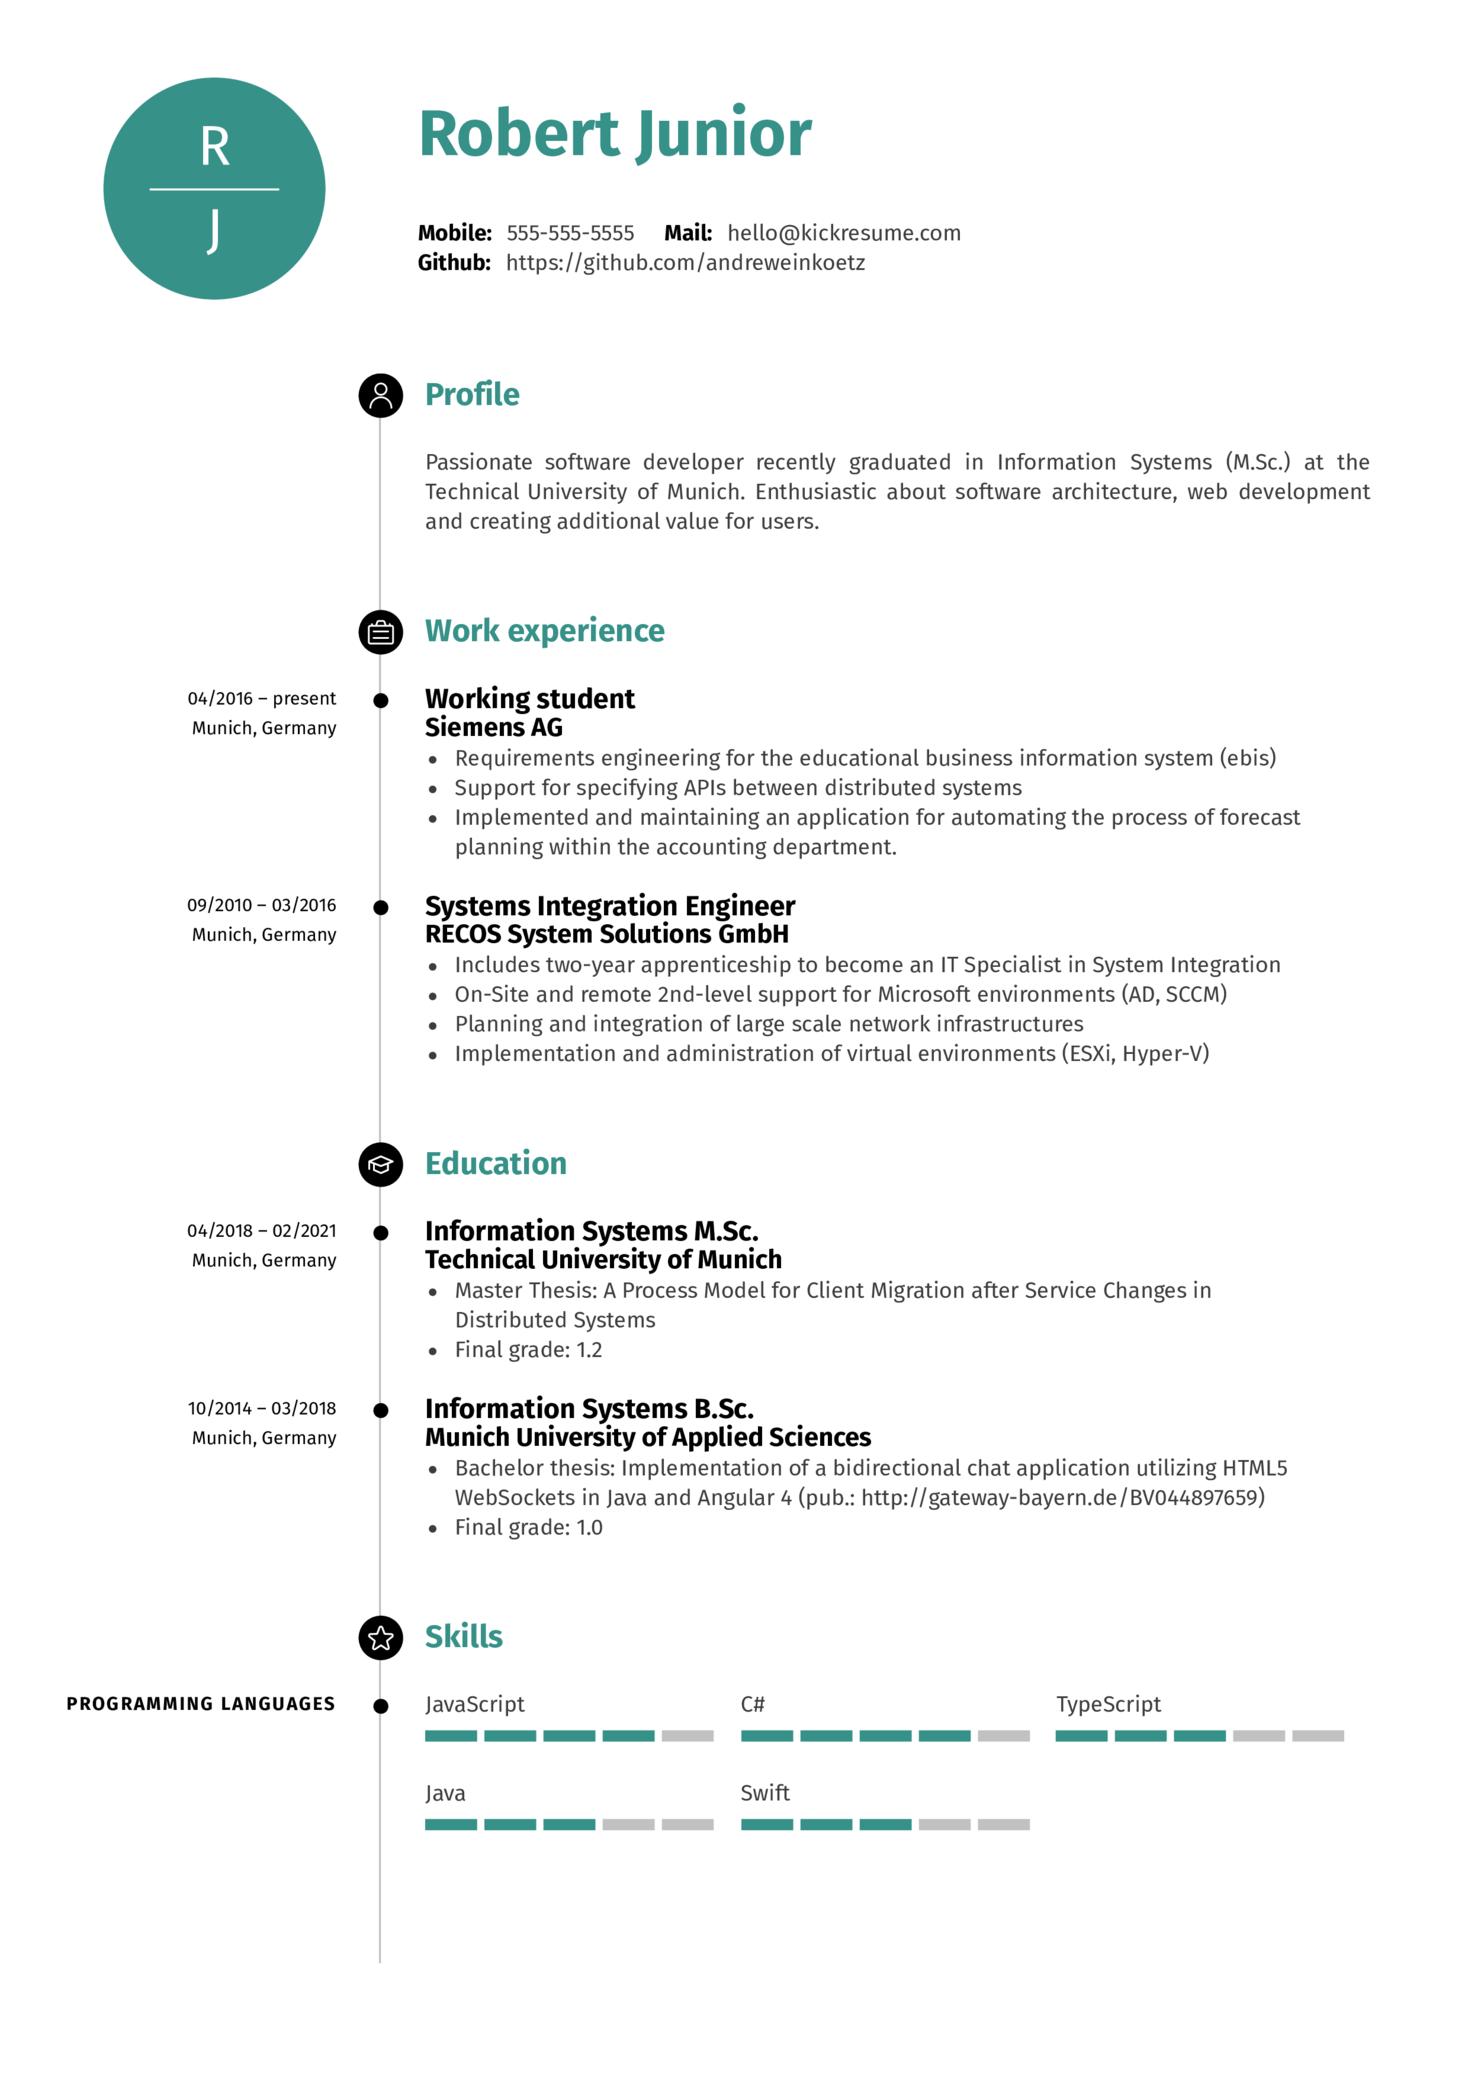 Software Engineer at Volkswagen Resume Template (Part 1)